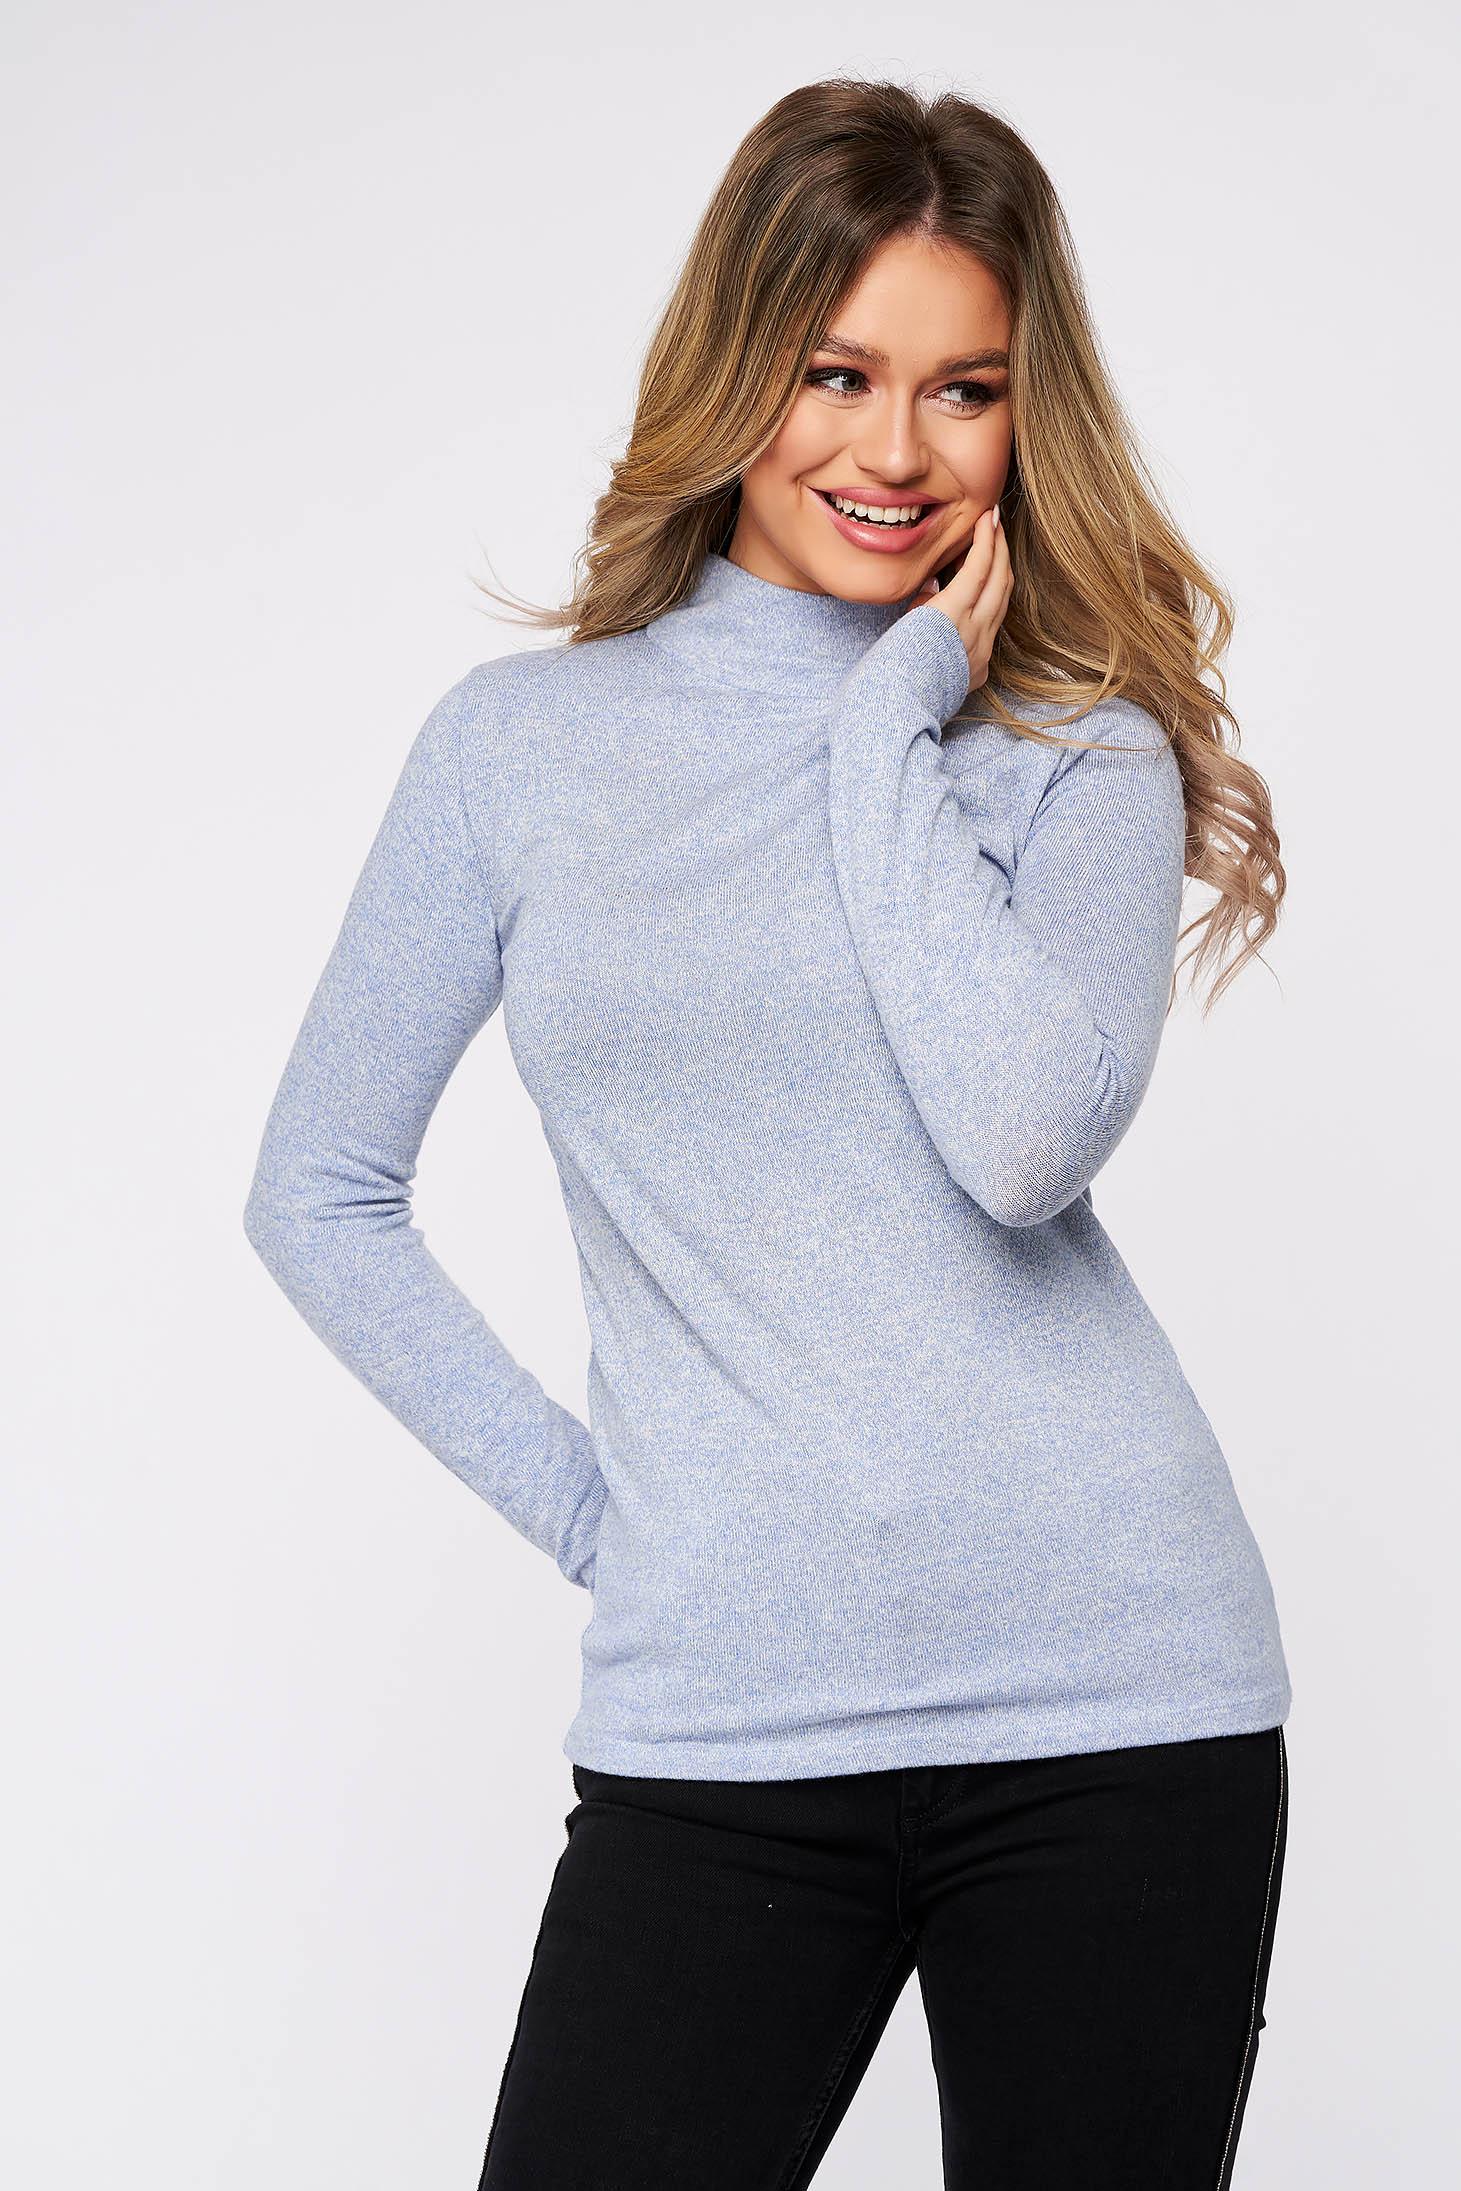 Bluza dama SunShine albastru-deschis din bumbac pe gat din material elastic si fin la atingere